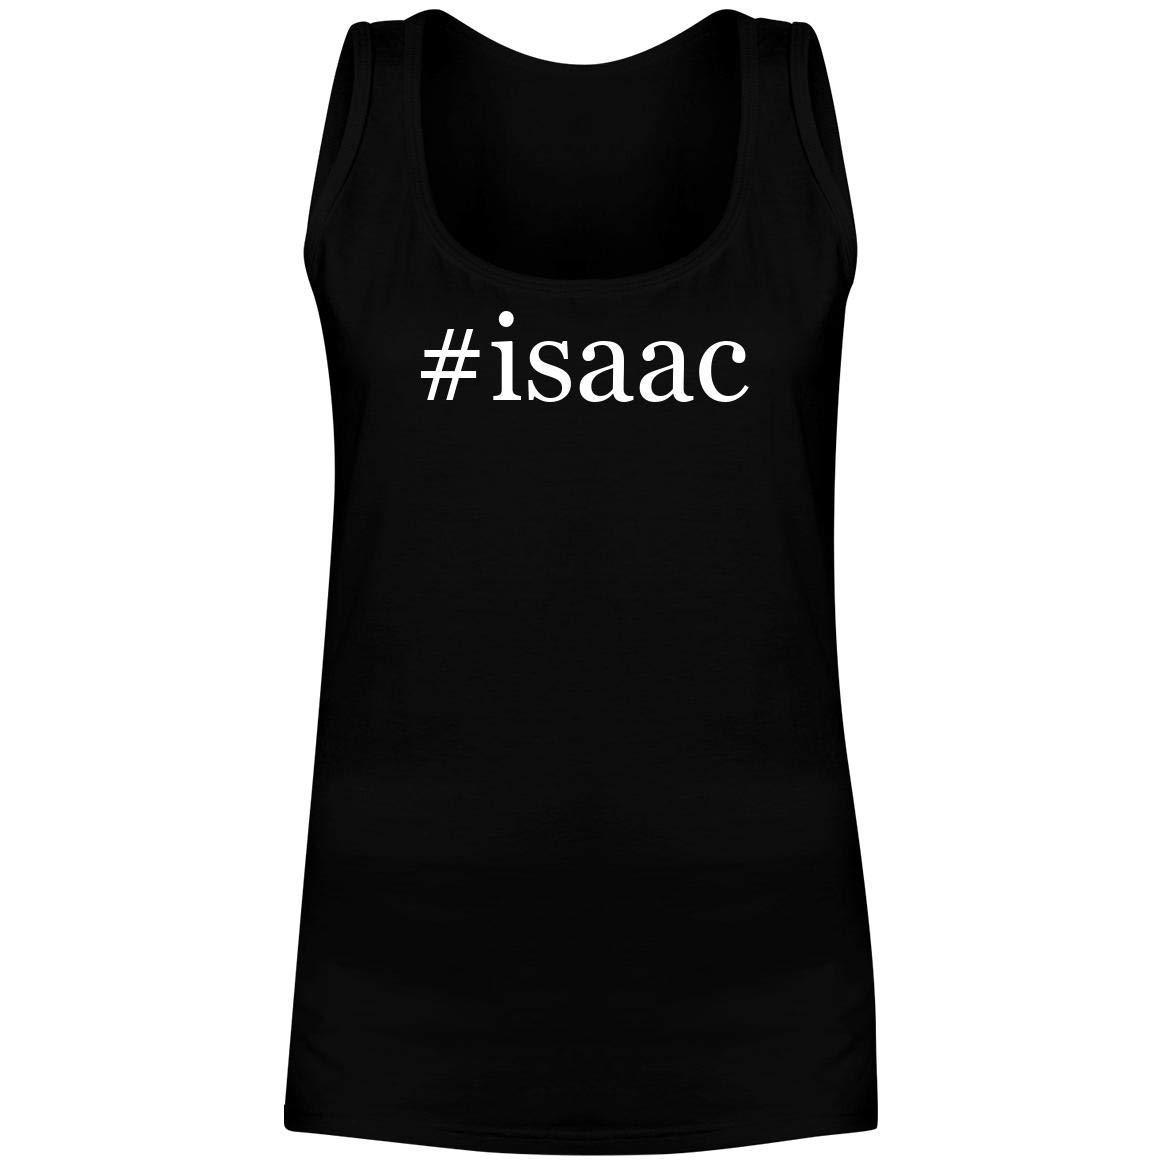 Amazon.com: The Town Butler #Isaac - A Soft & Comfortable ...